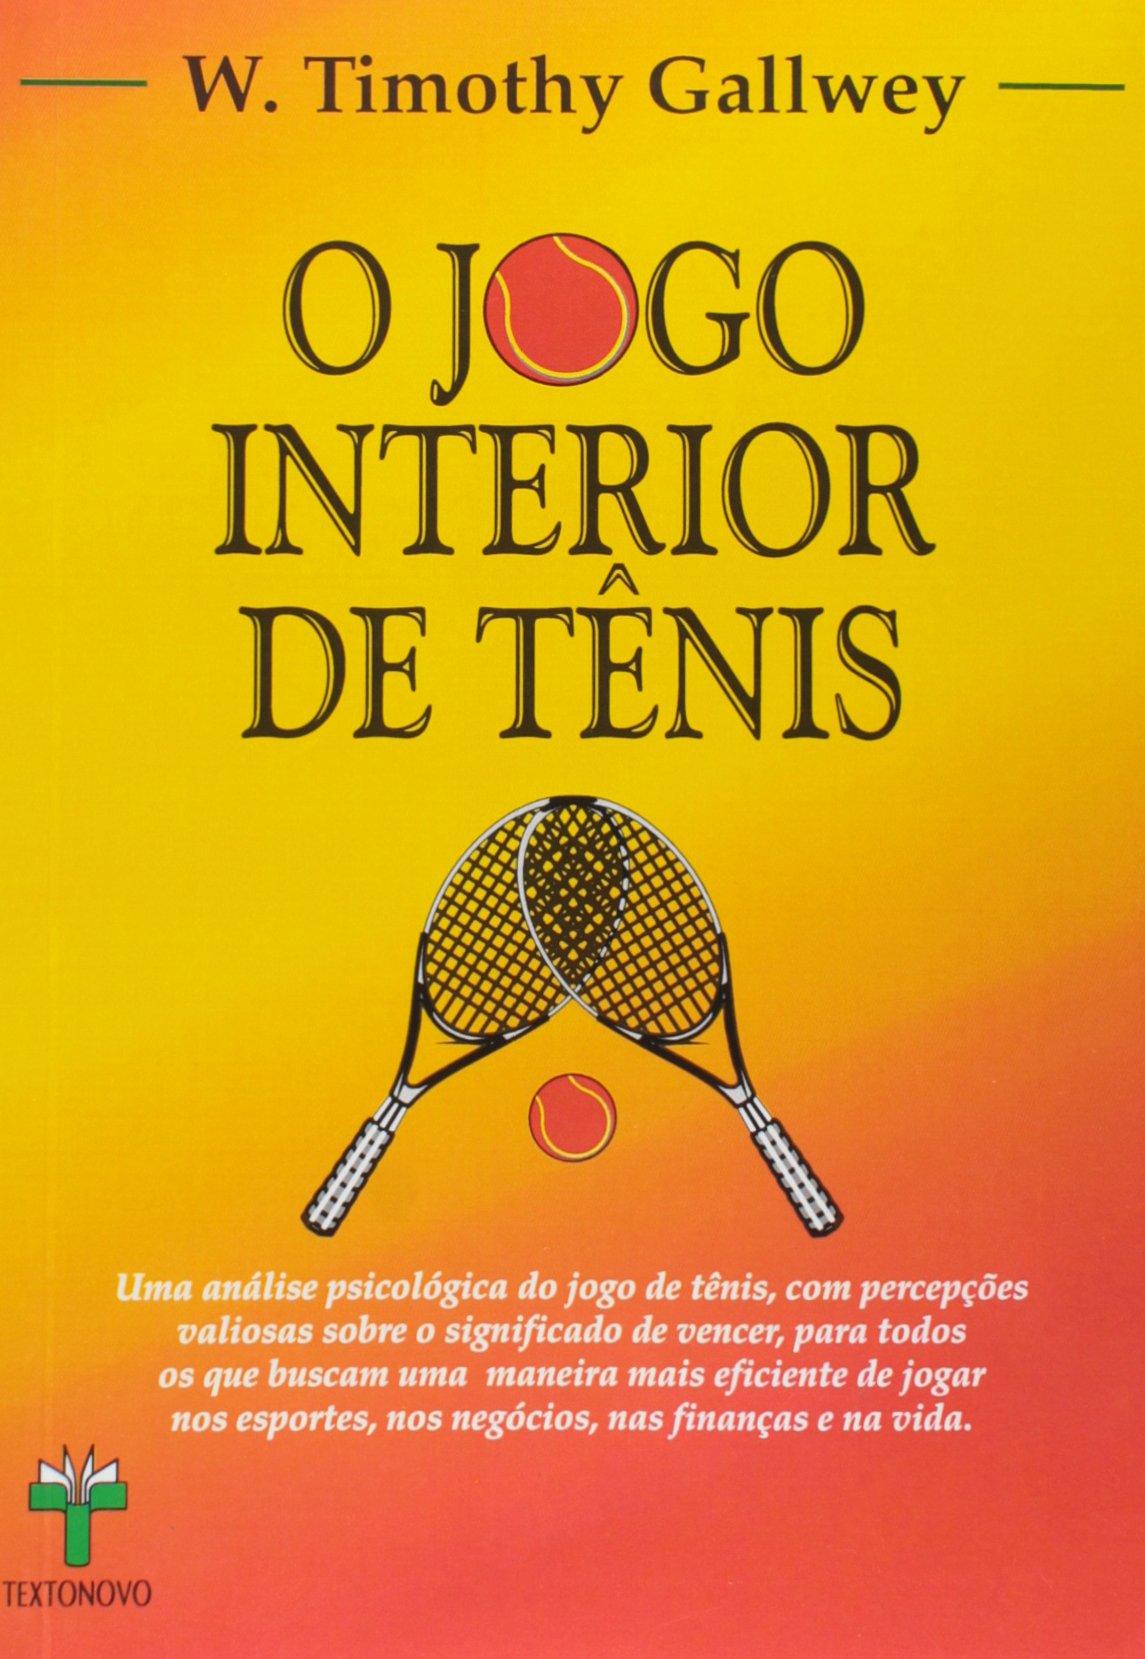 Jogo Interior de Tenis, O (Portuguese Brazilian) Paperback – 1996